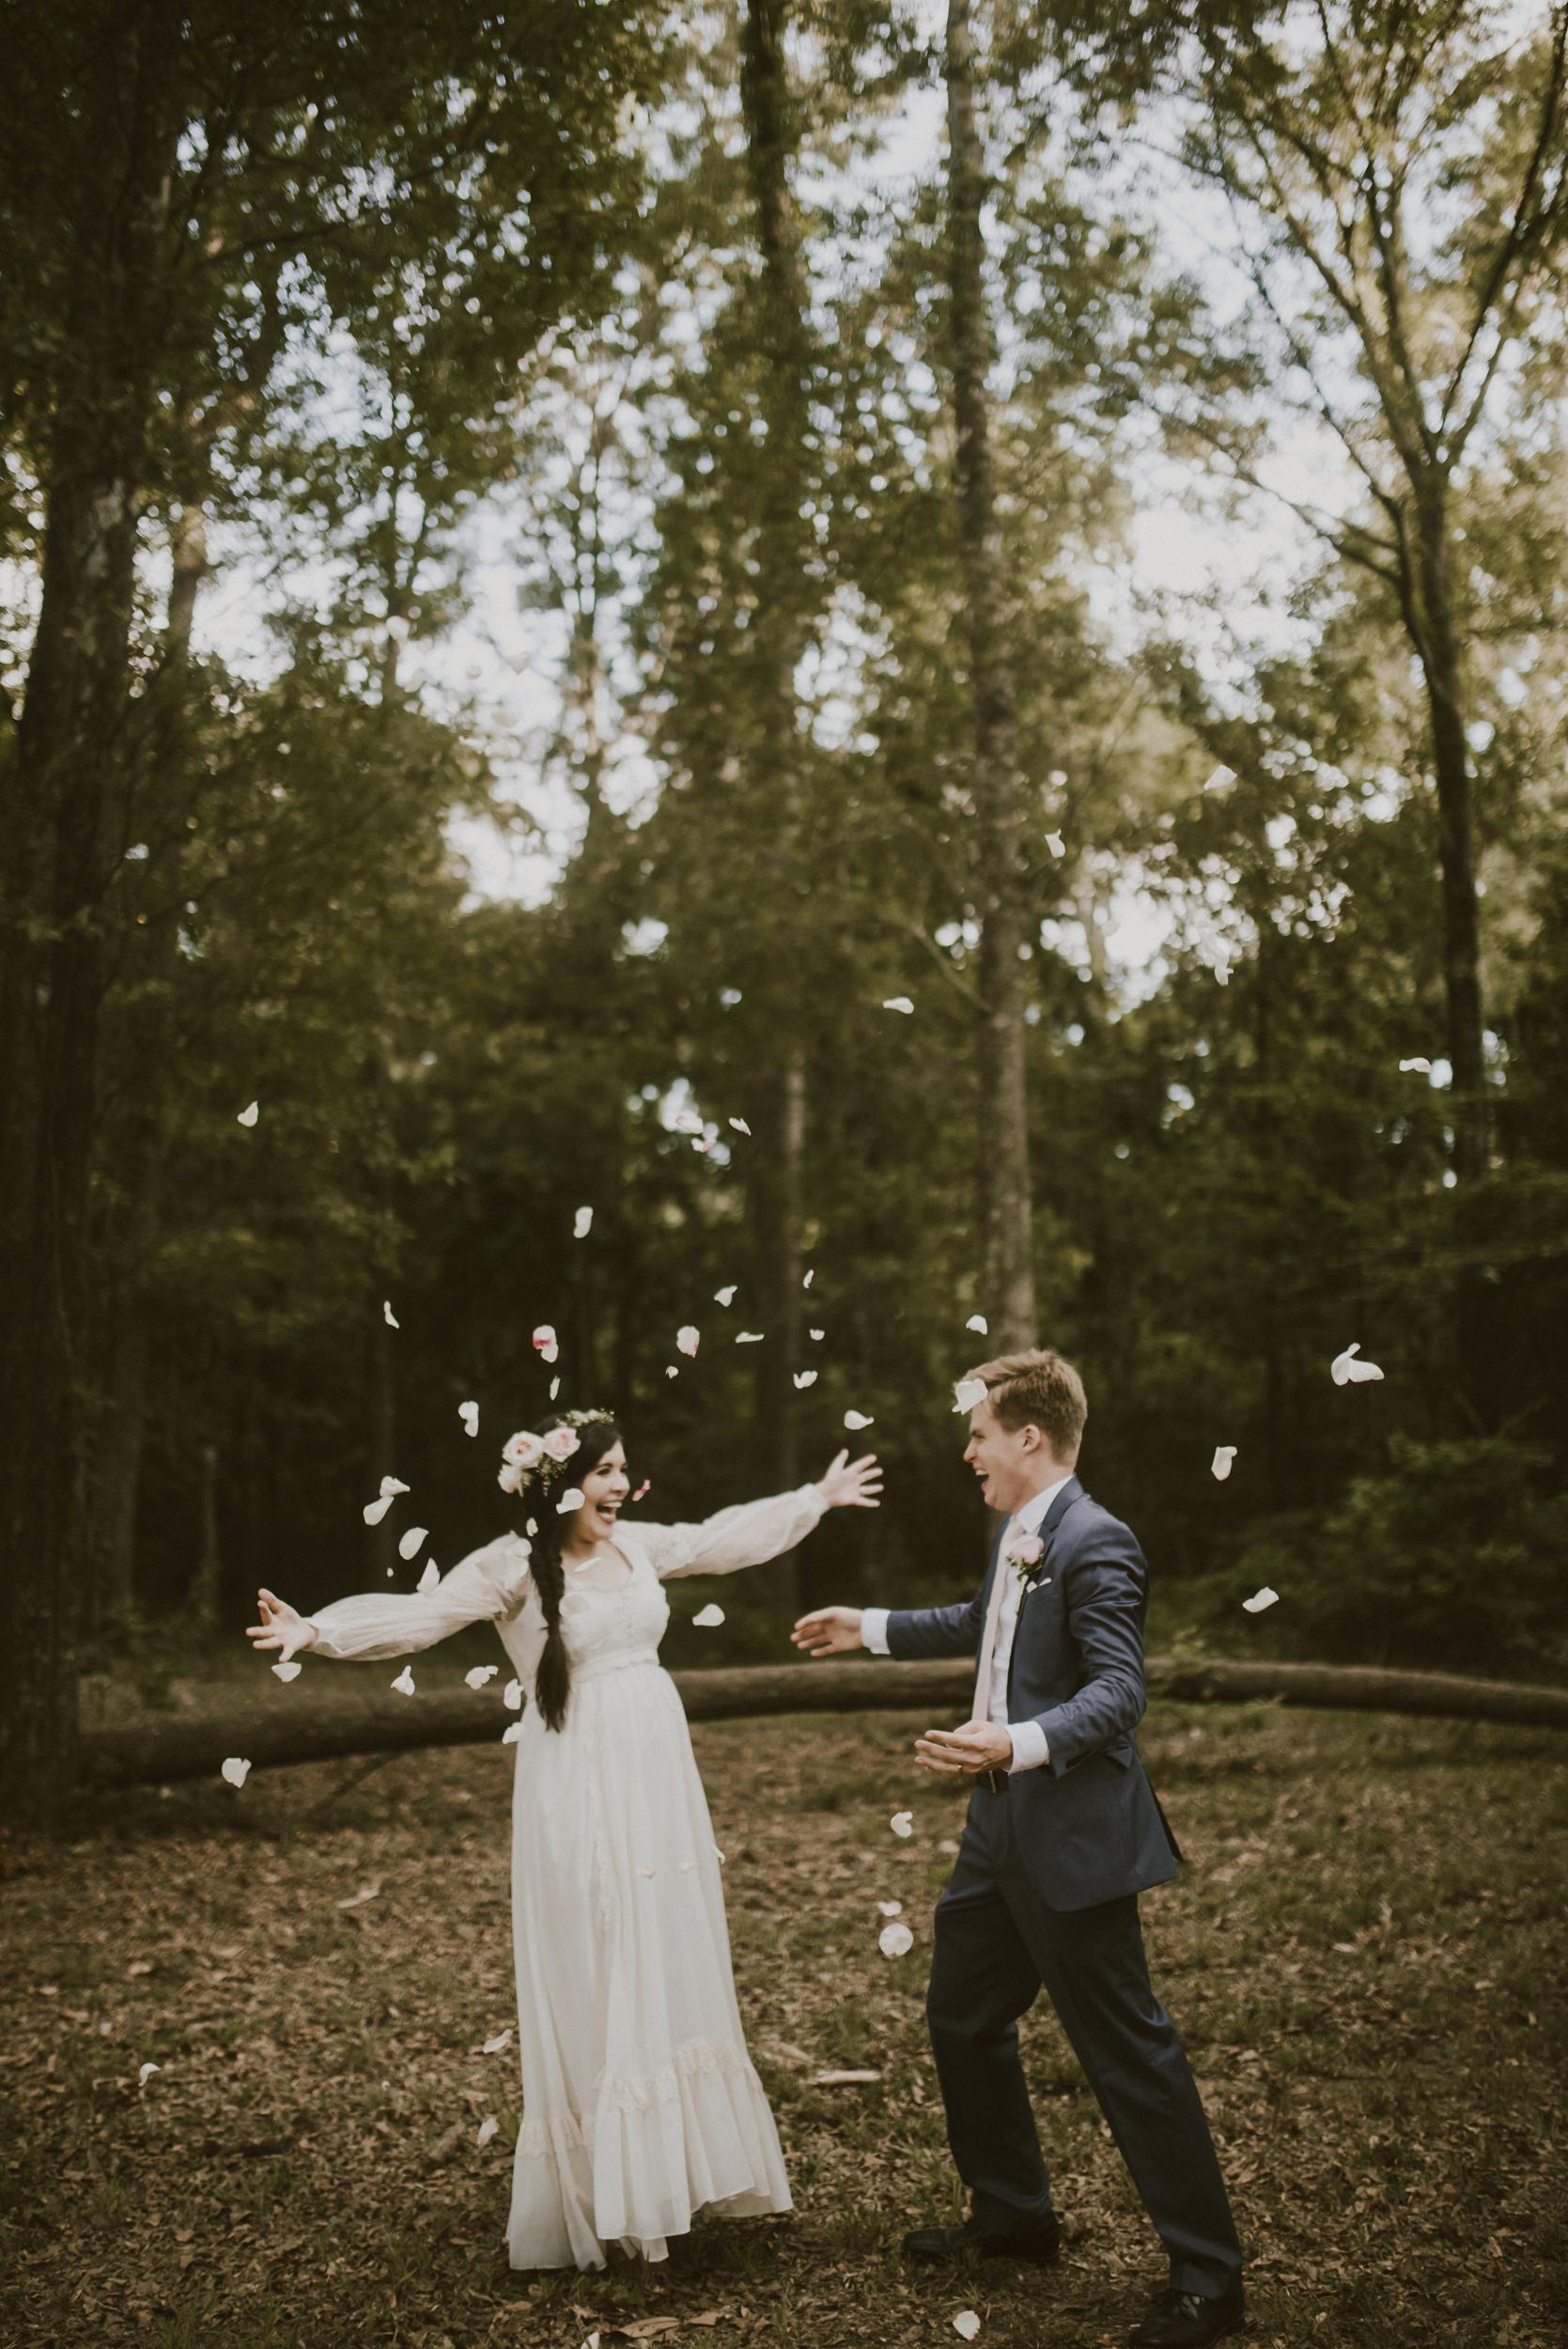 ofRen_weddingphotographer-142.jpg